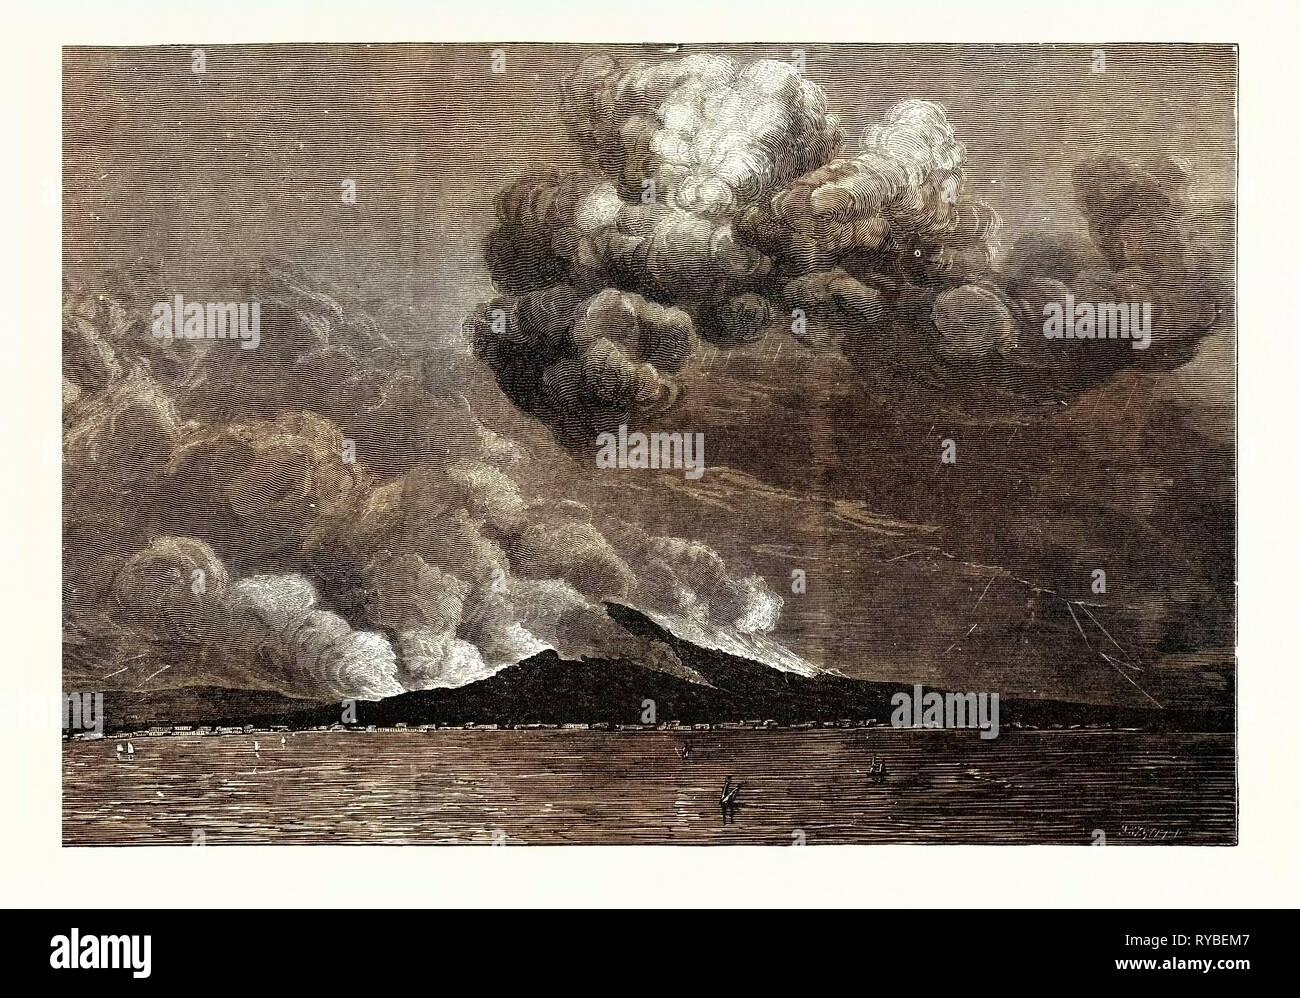 MOUNT VESUVIUS VOLCANO ERUPTING POPULACE ATTACKING THE SAN GENNARO STATUE